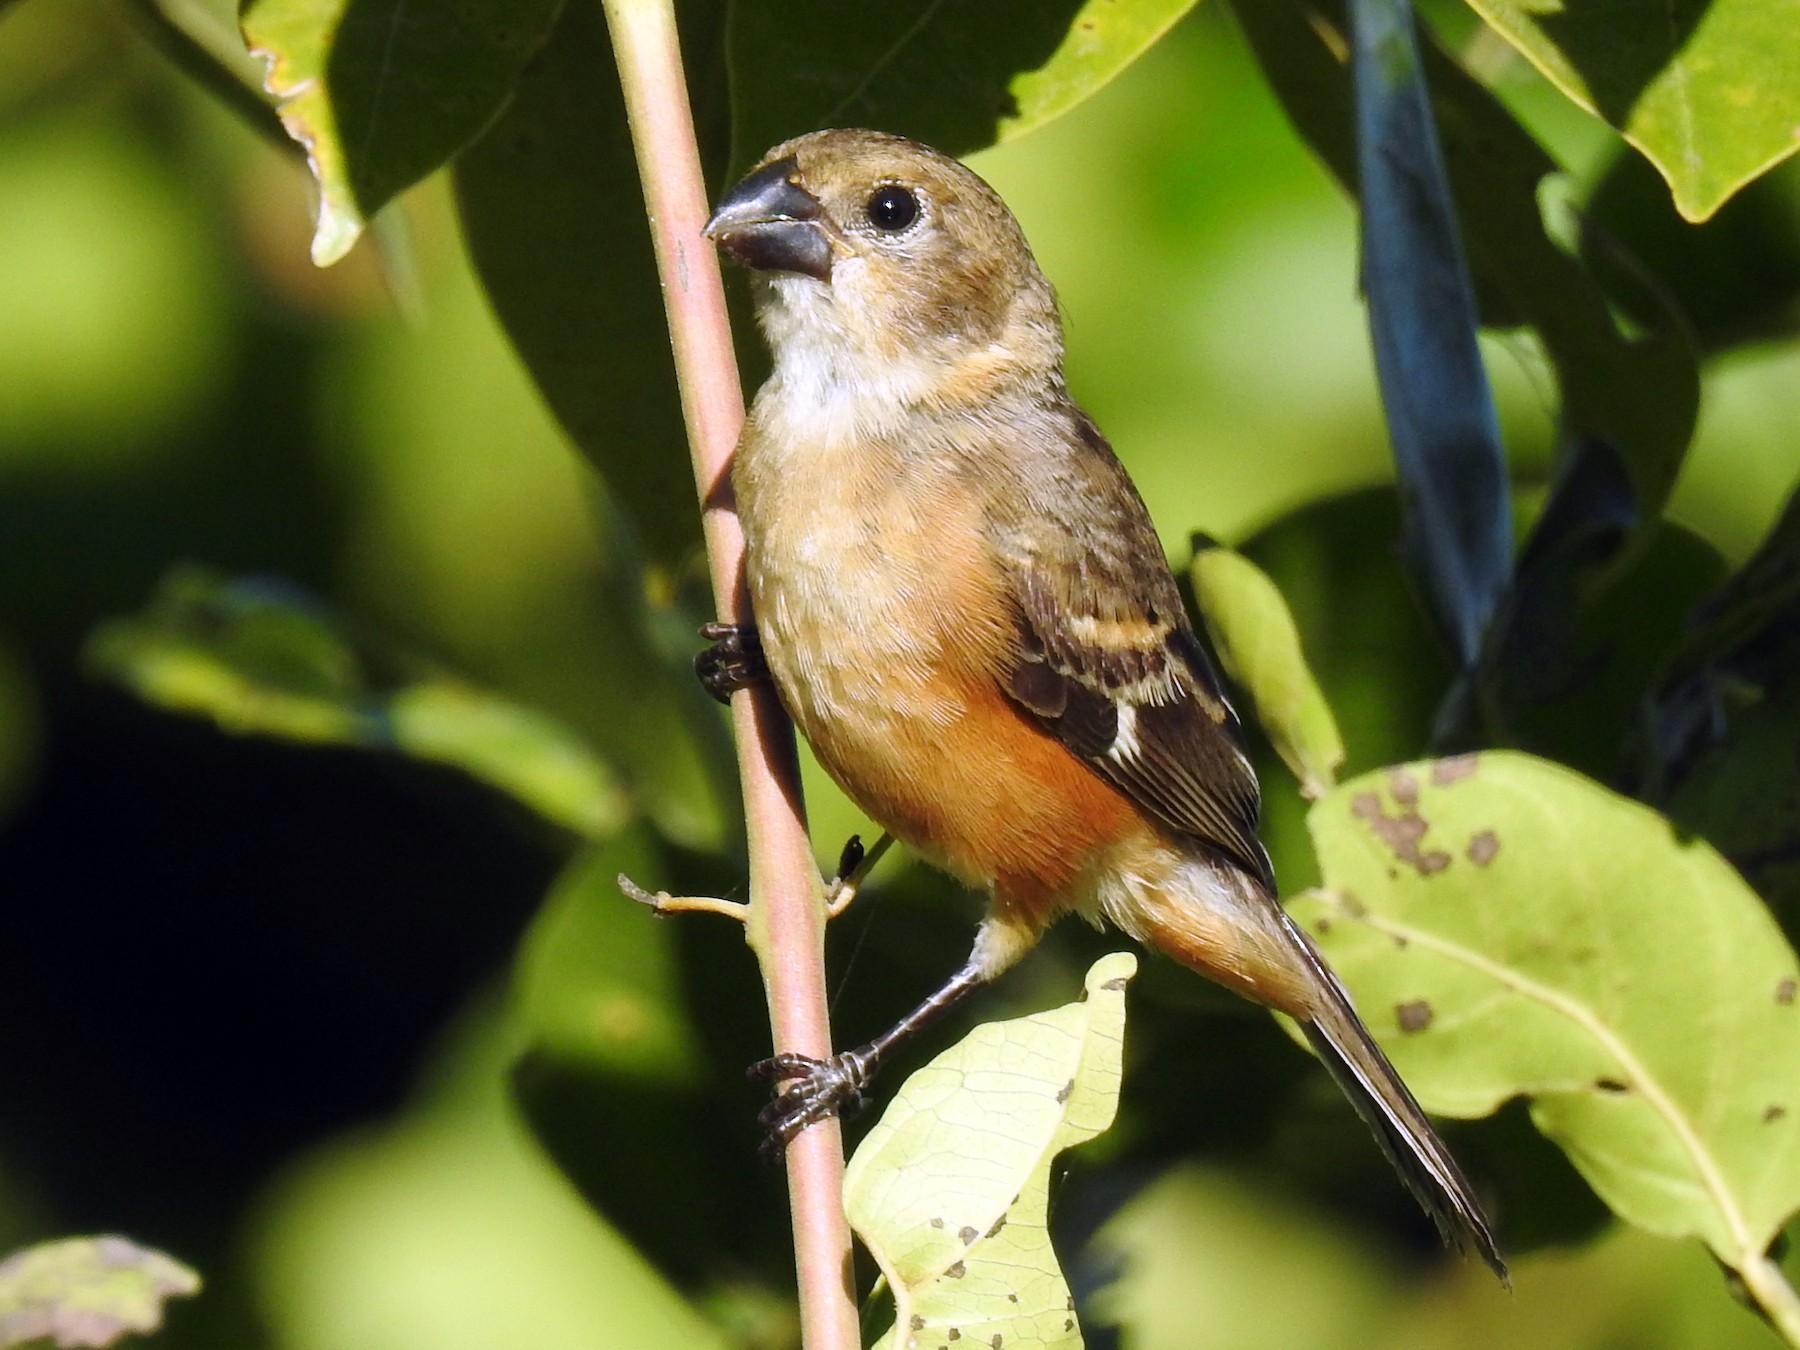 Tawny-bellied Seedeater - Ana Paula Alminhana Maciel